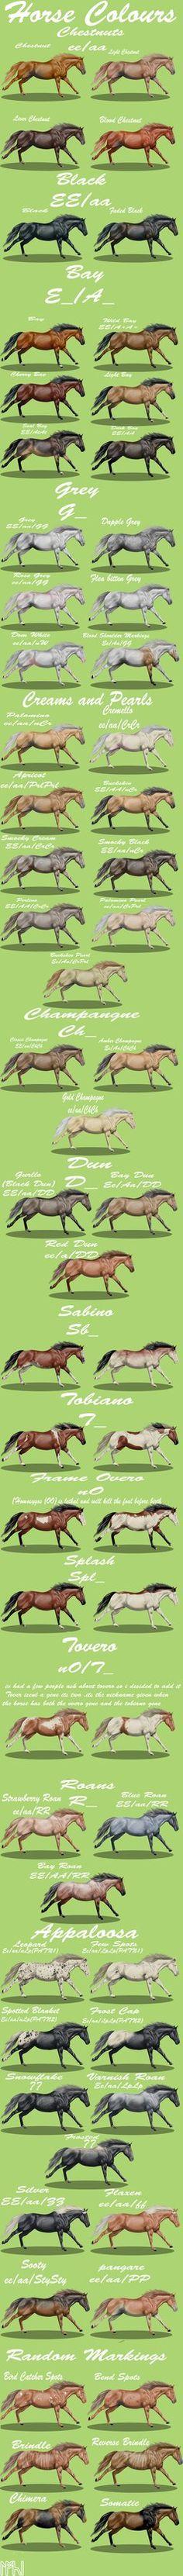 http://magicwindsstables.deviantart.com/art/Horse-colours-complete-358513466